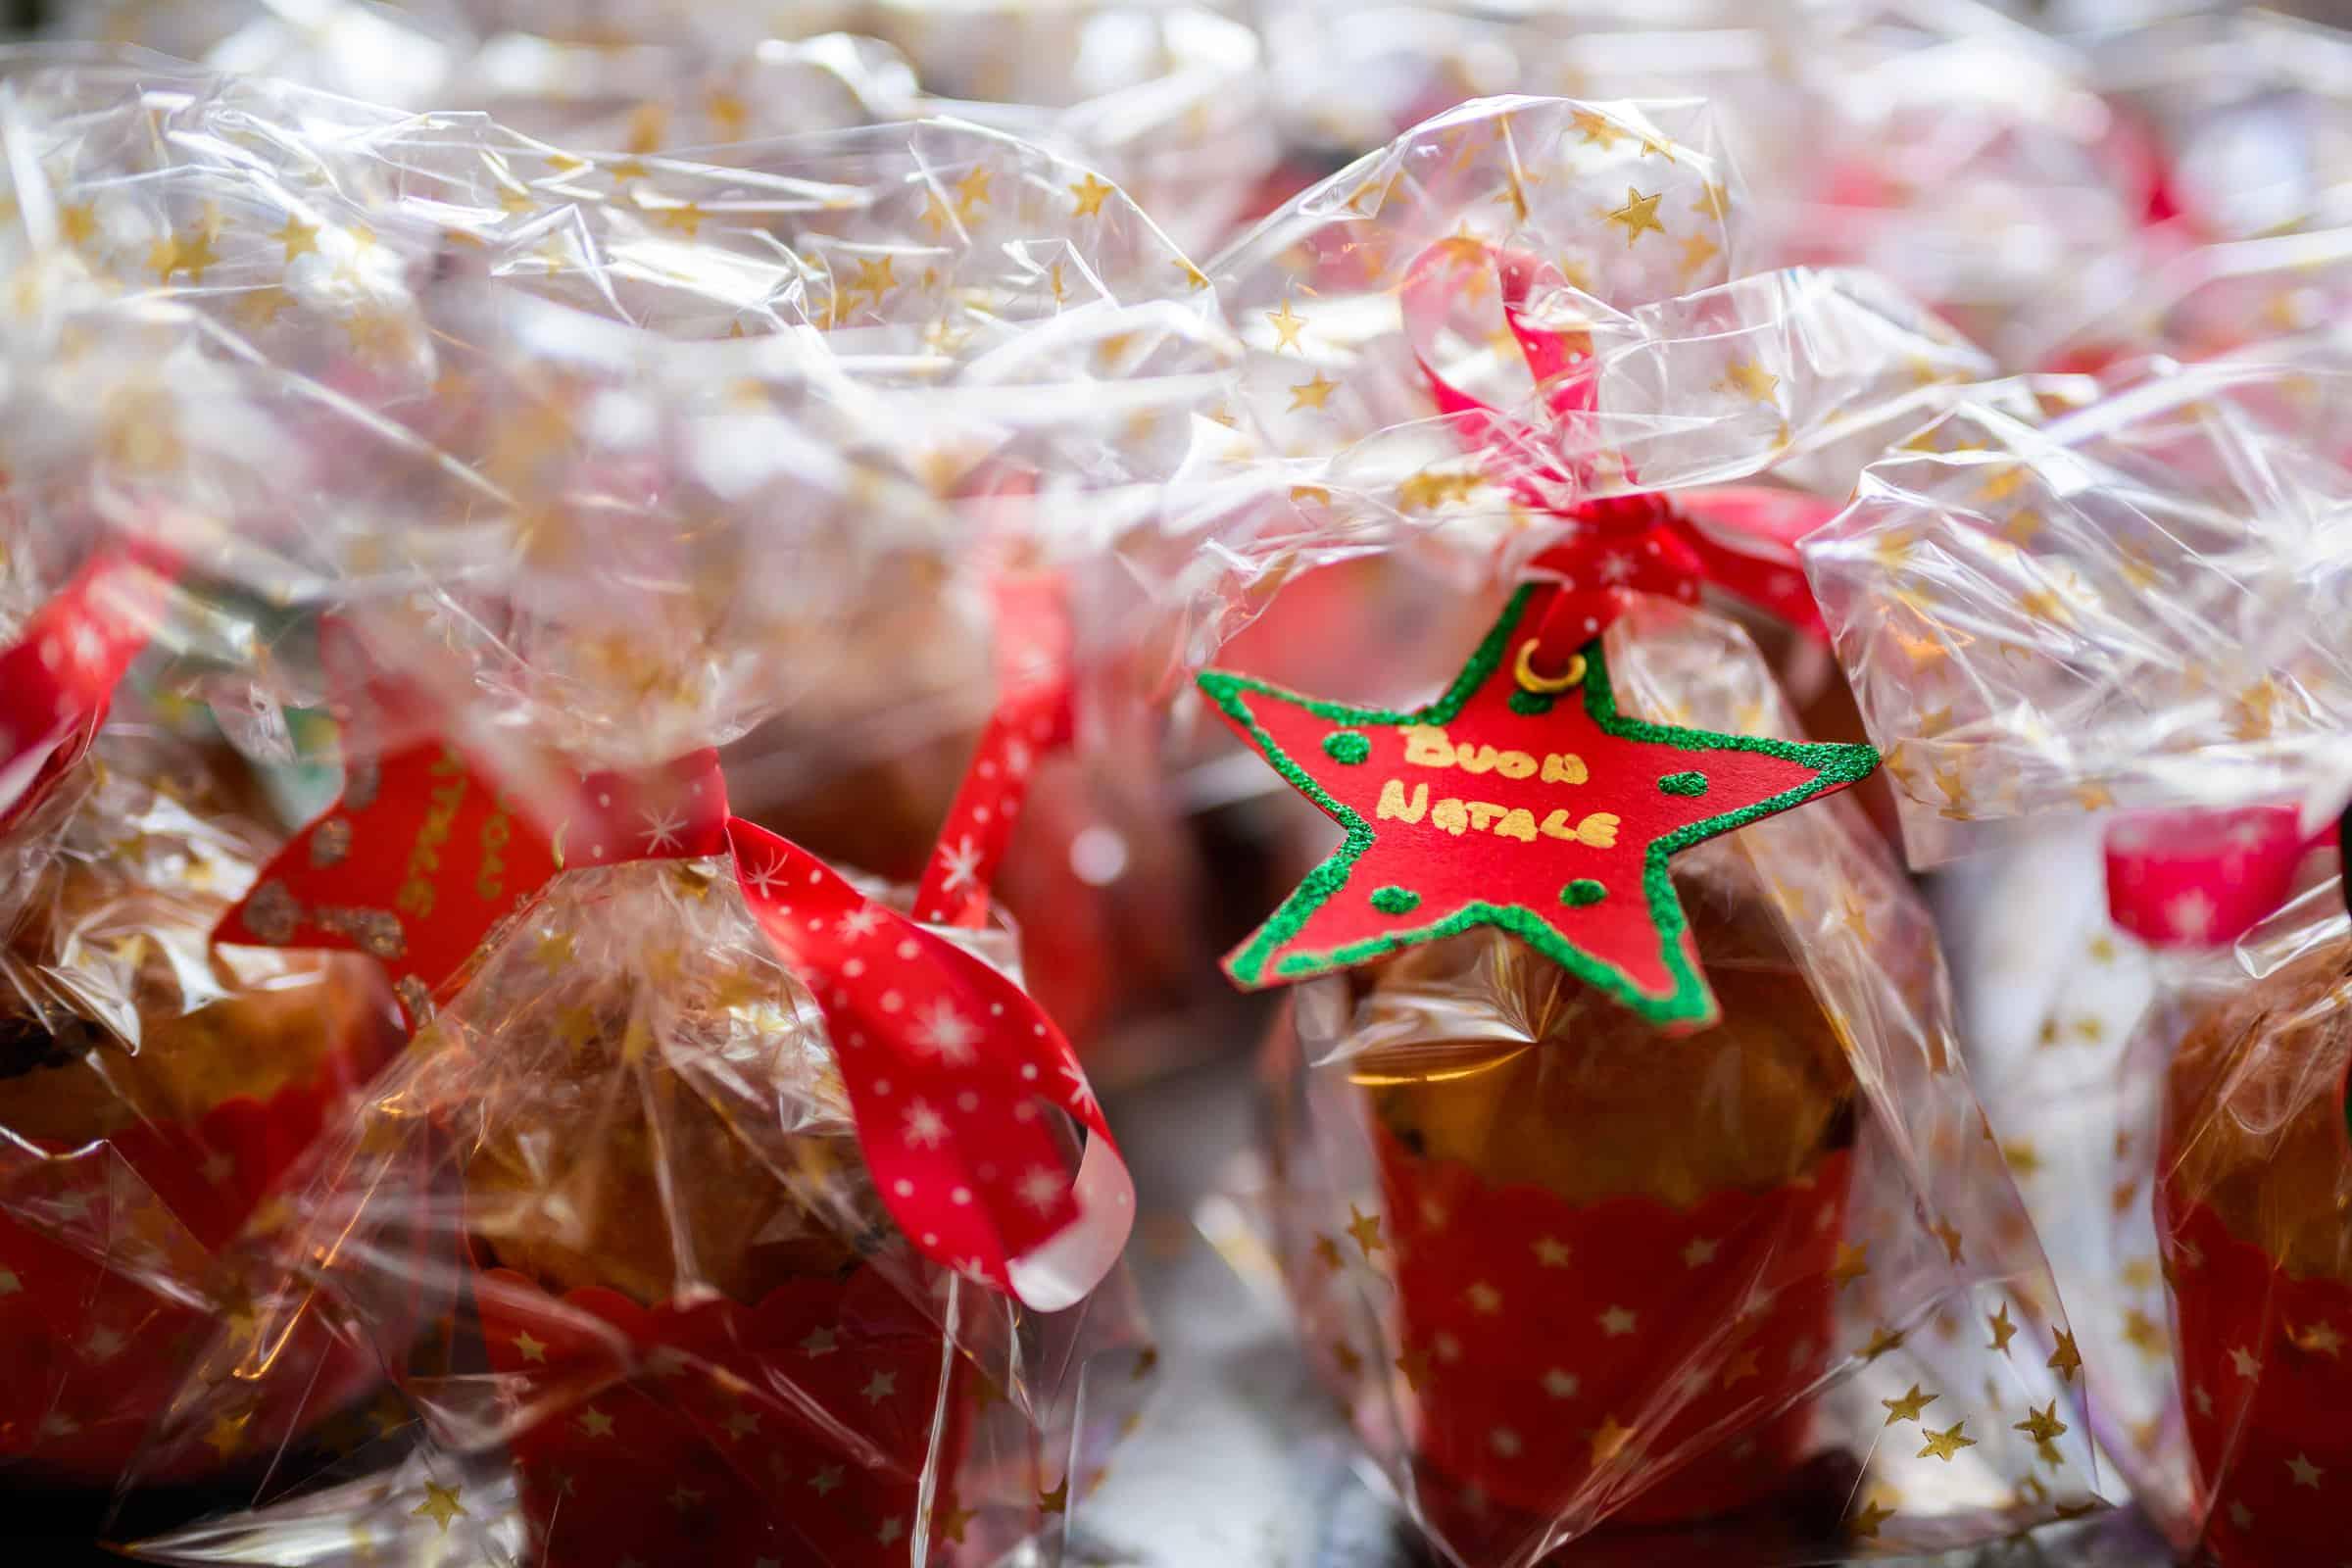 Ricetta Mini Panettoni regalo Buon Natale GnamAm.com